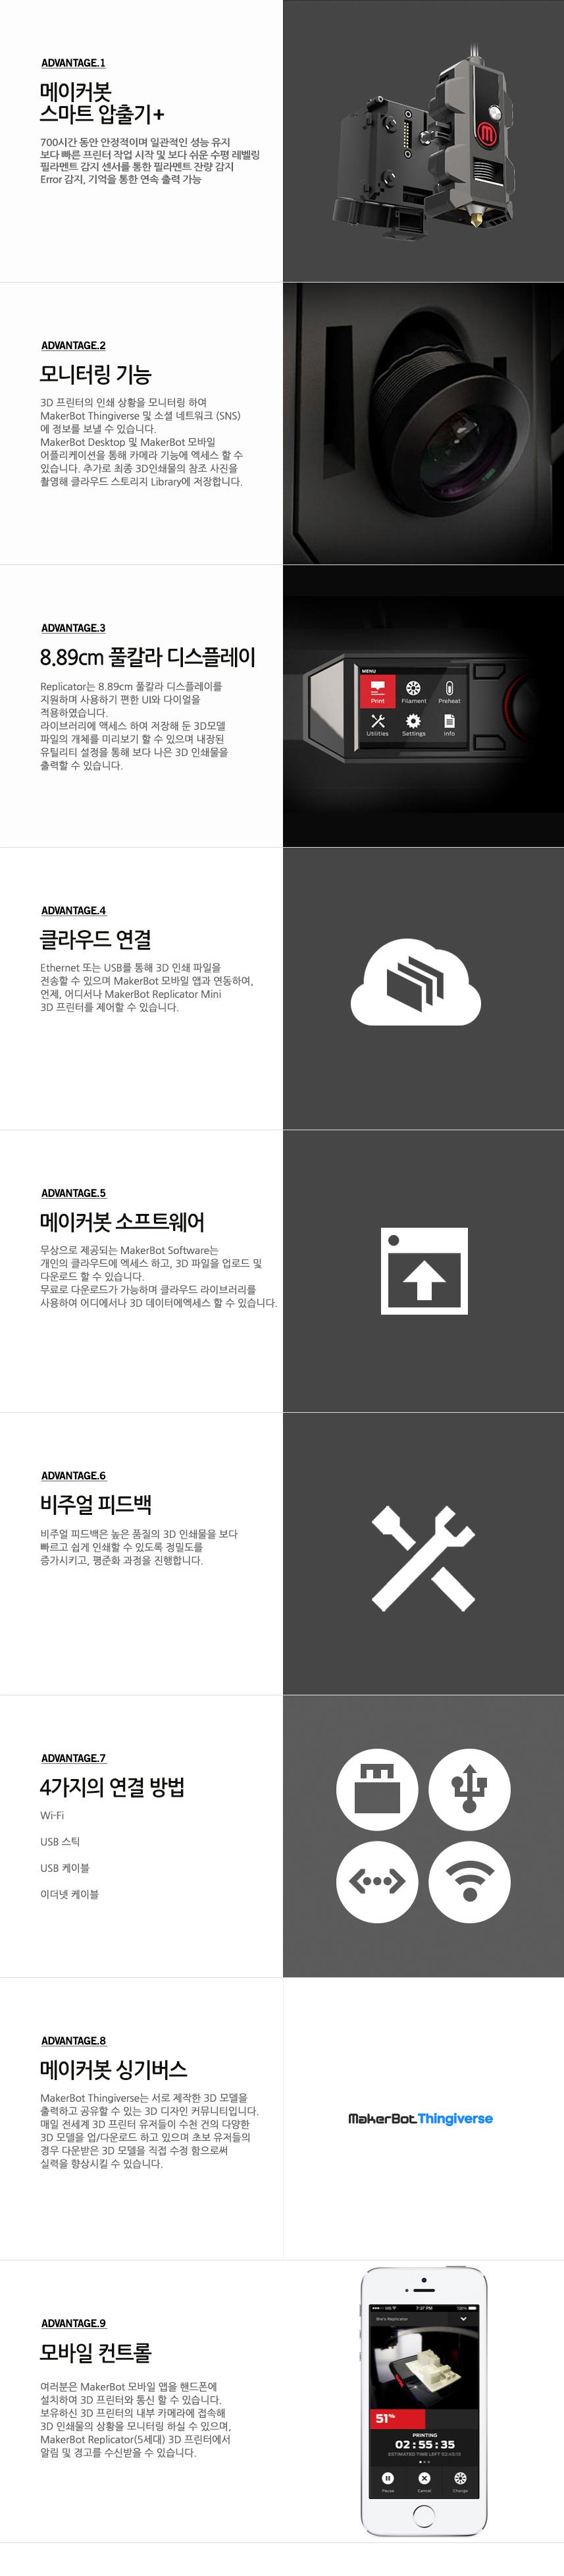 Replicator+ 제품소개3.jpg